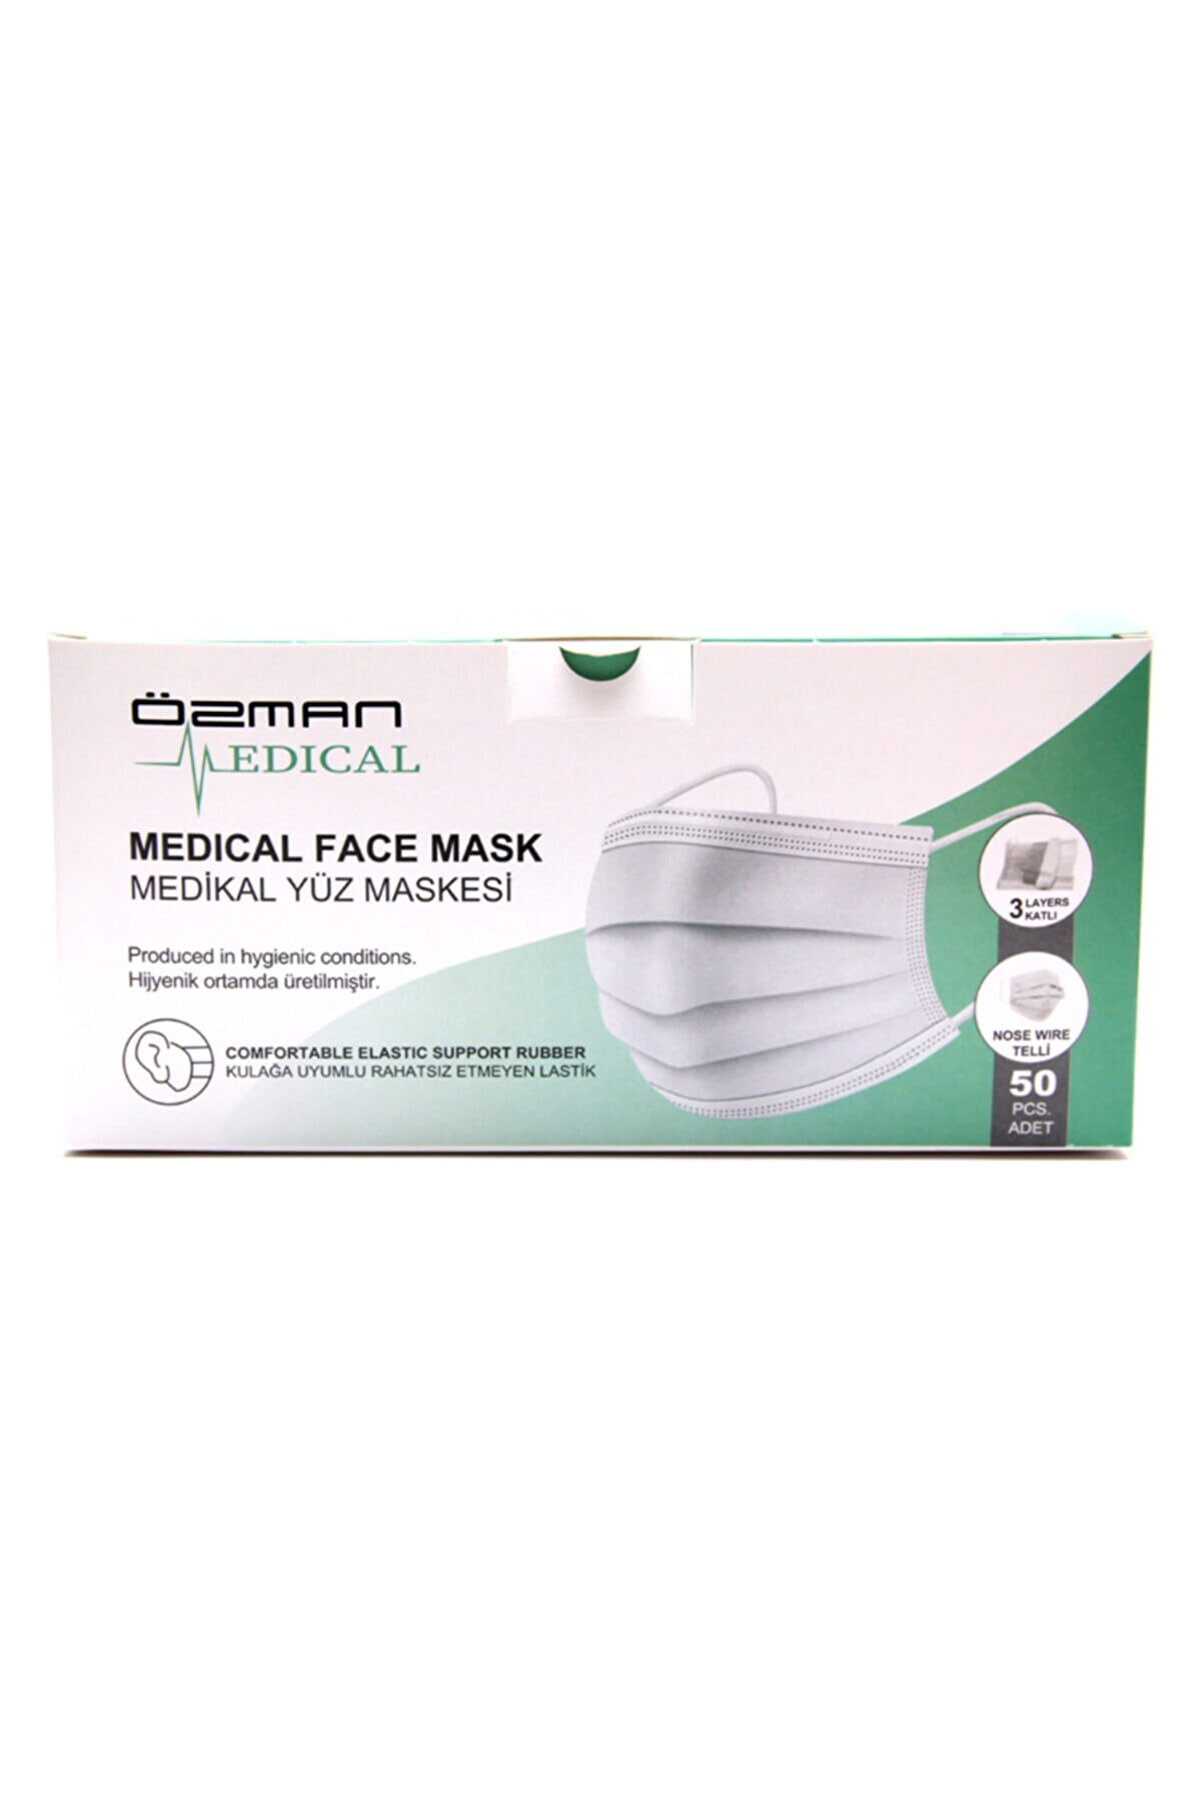 Özman Medical Üç Katlı Telli Meltblownlu Beyaz Cerrahi Maske 50 Adet